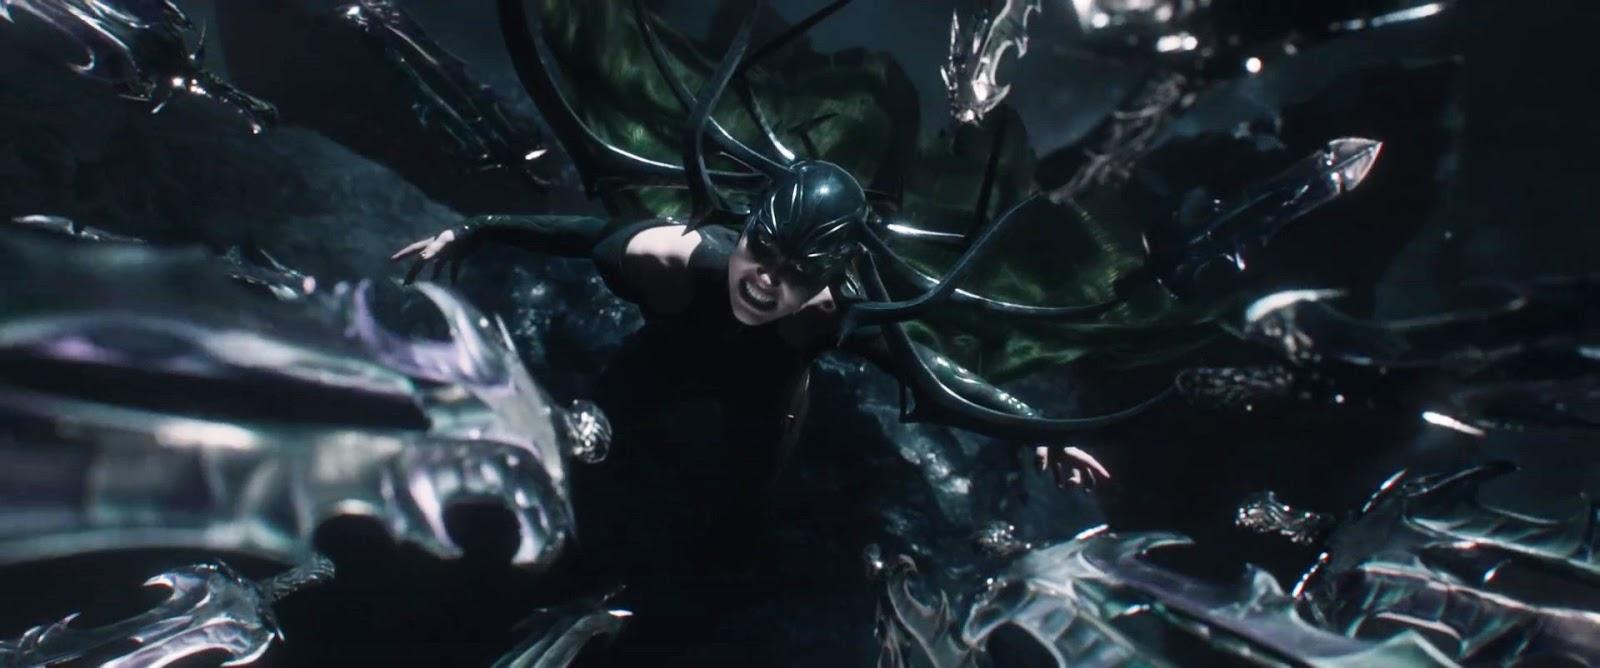 Thor: Ragnarok (2017) | This Island Rod